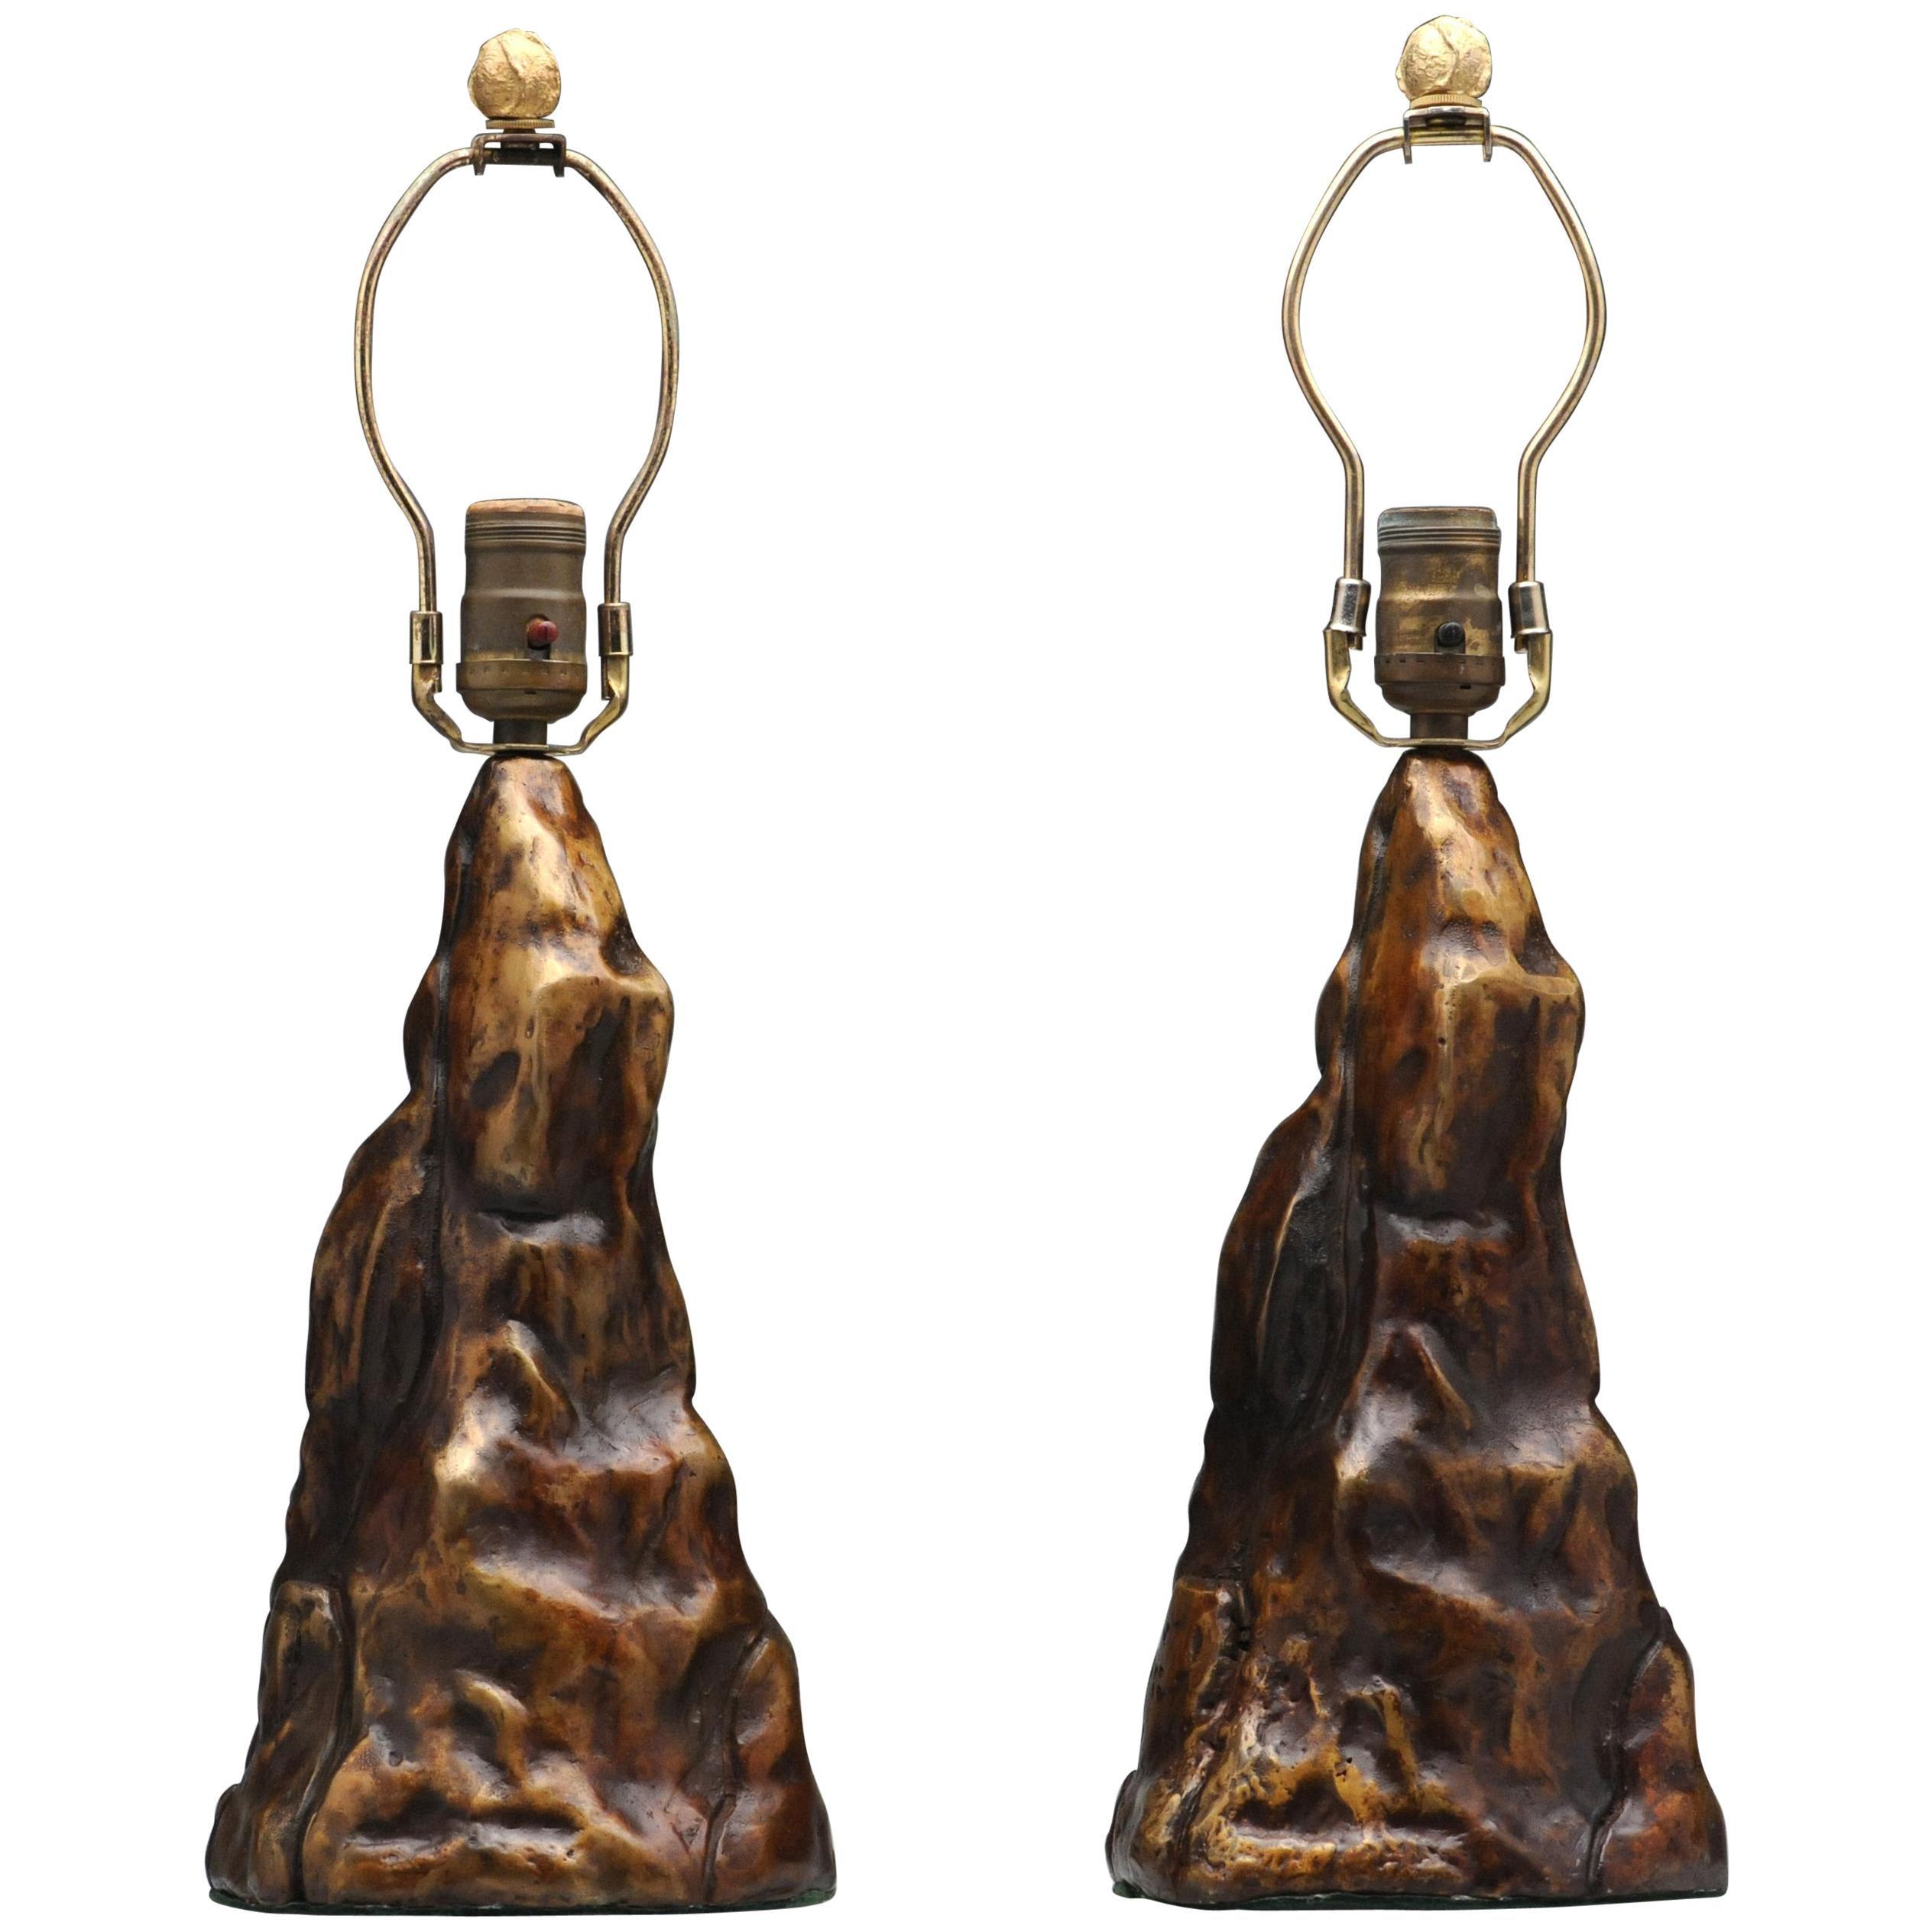 Vintage Pair of Brutalist Bronze Sculptural Table Lamps